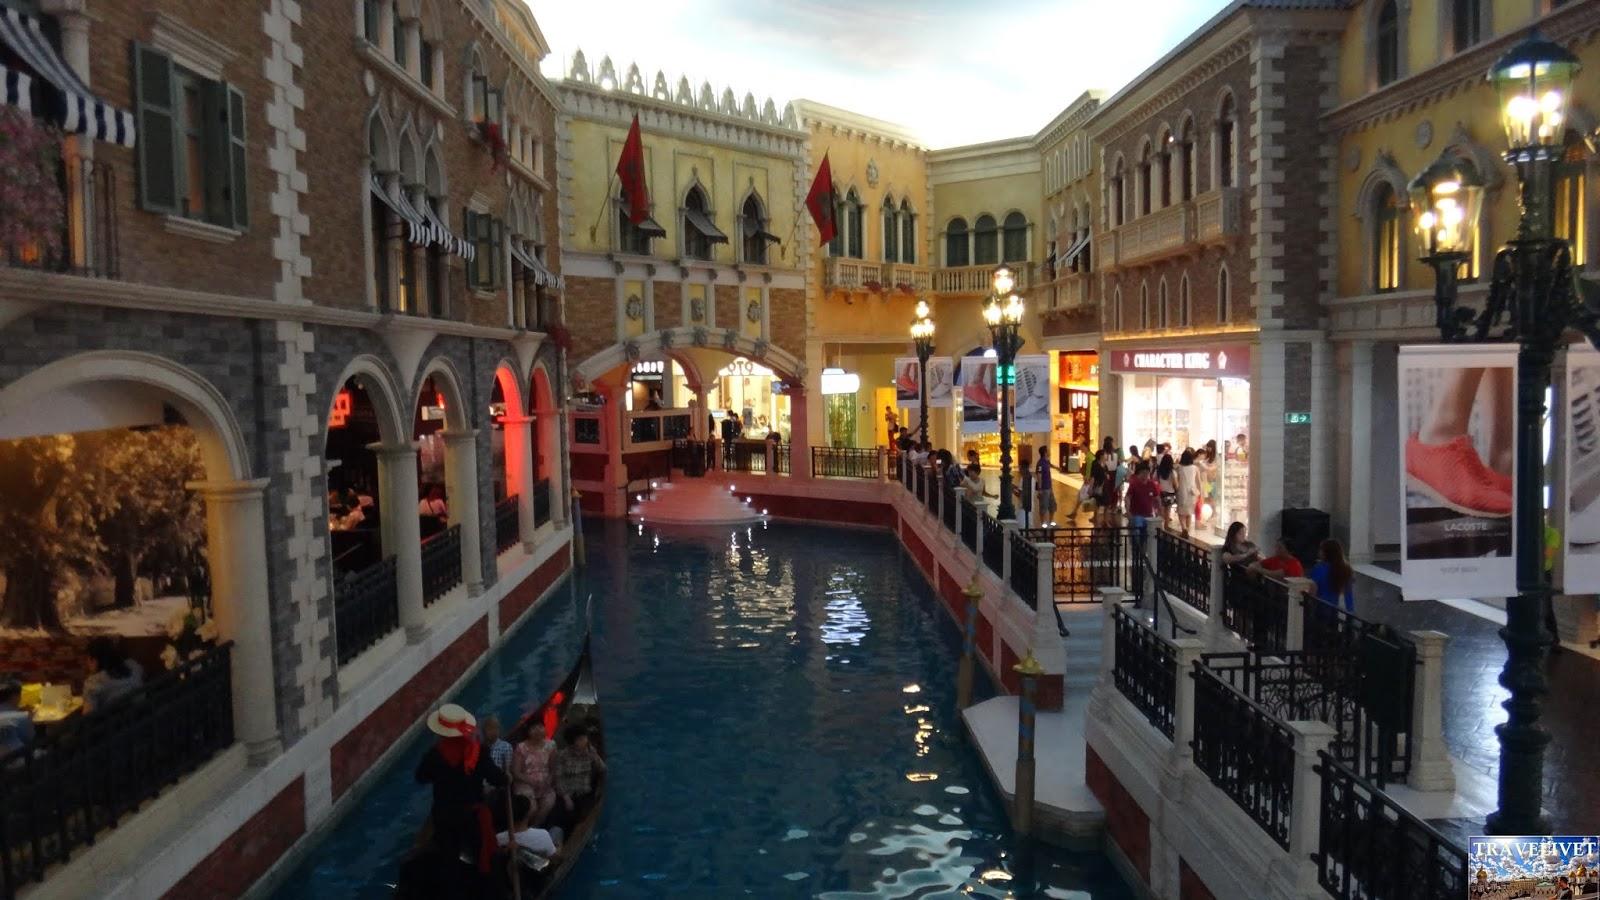 Chine China Macao Macau venise